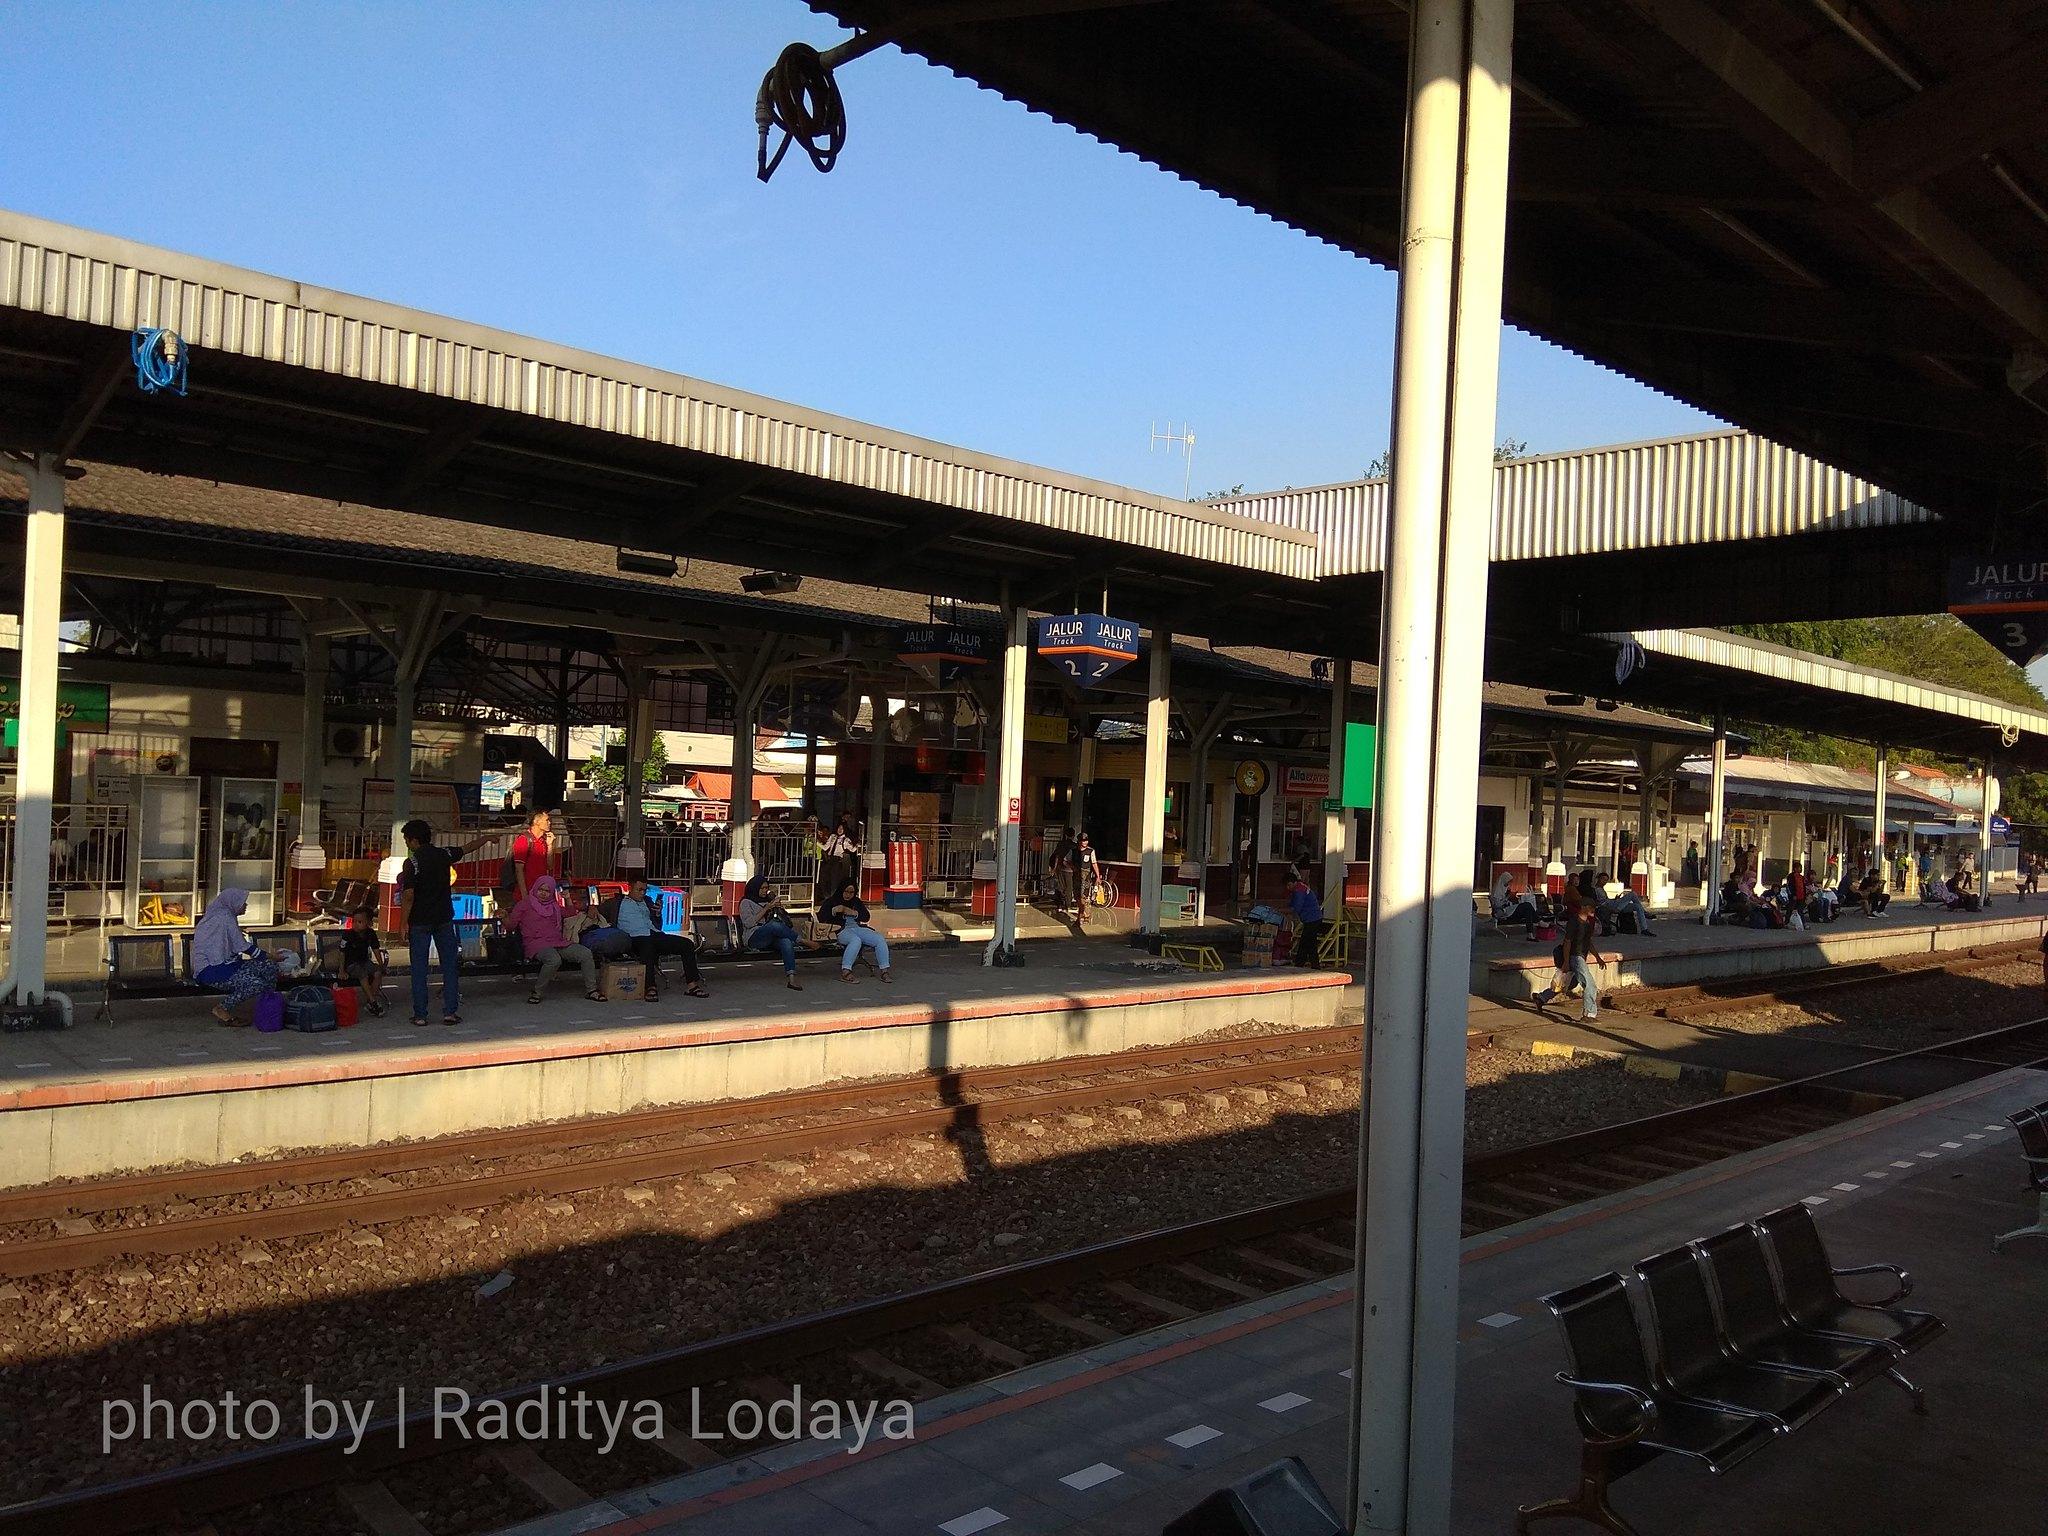 29 TRIP REPORT KERETA API JAYABAYA 1 (JAKARTA-CIREBON) -- STASIUN CIREBON PRUJAKAN 3